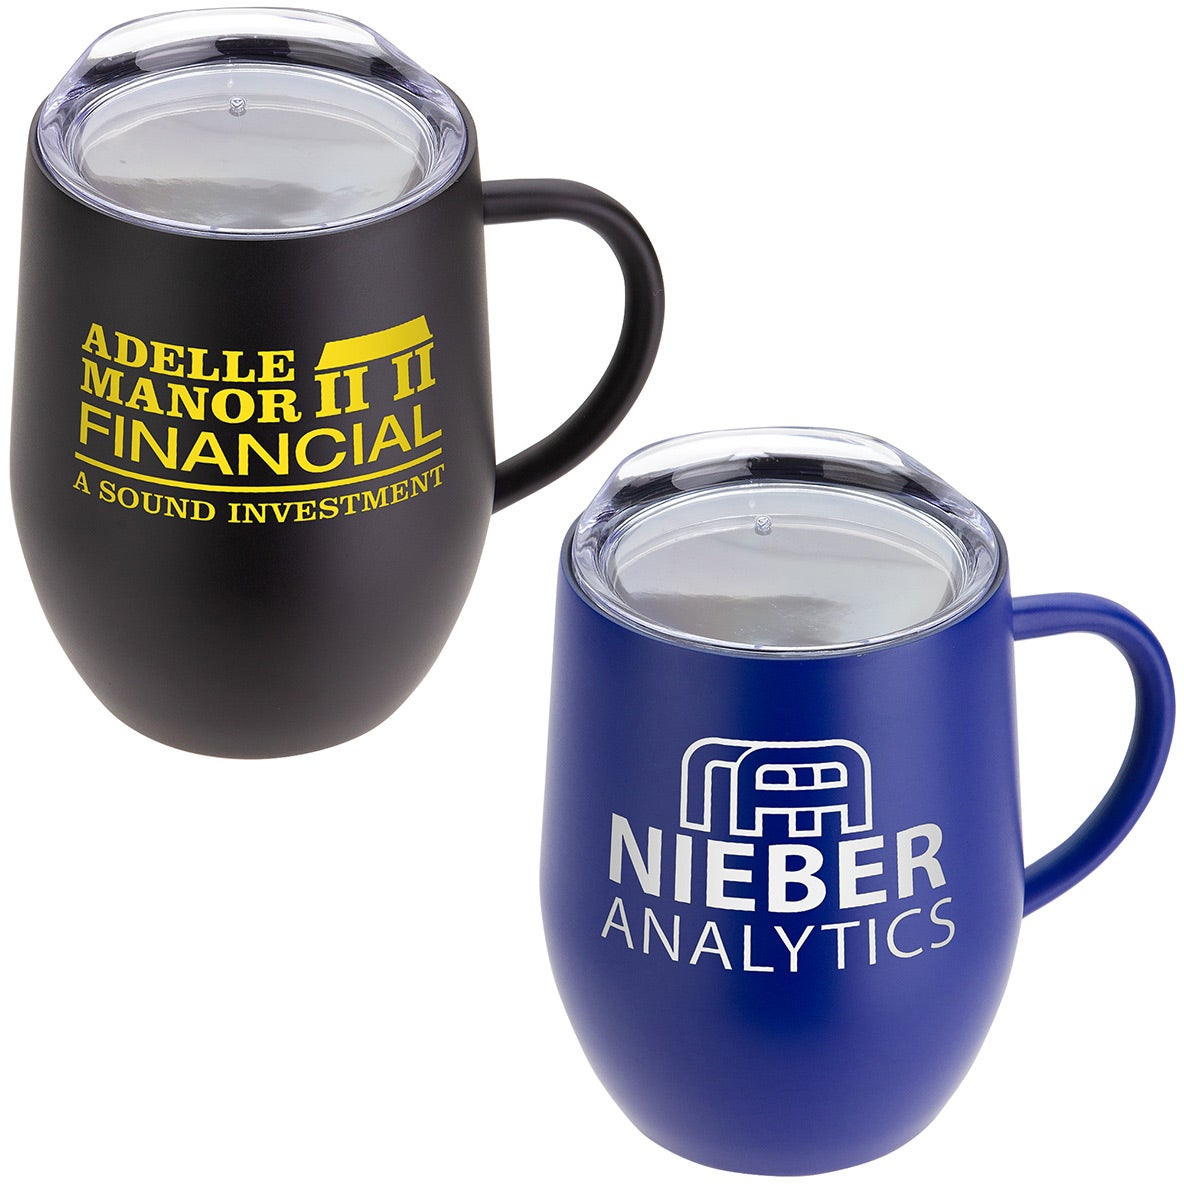 Calibre Vacuum Insulated Ceramic Inside-Coated Coffee Mug (12 Oz.)